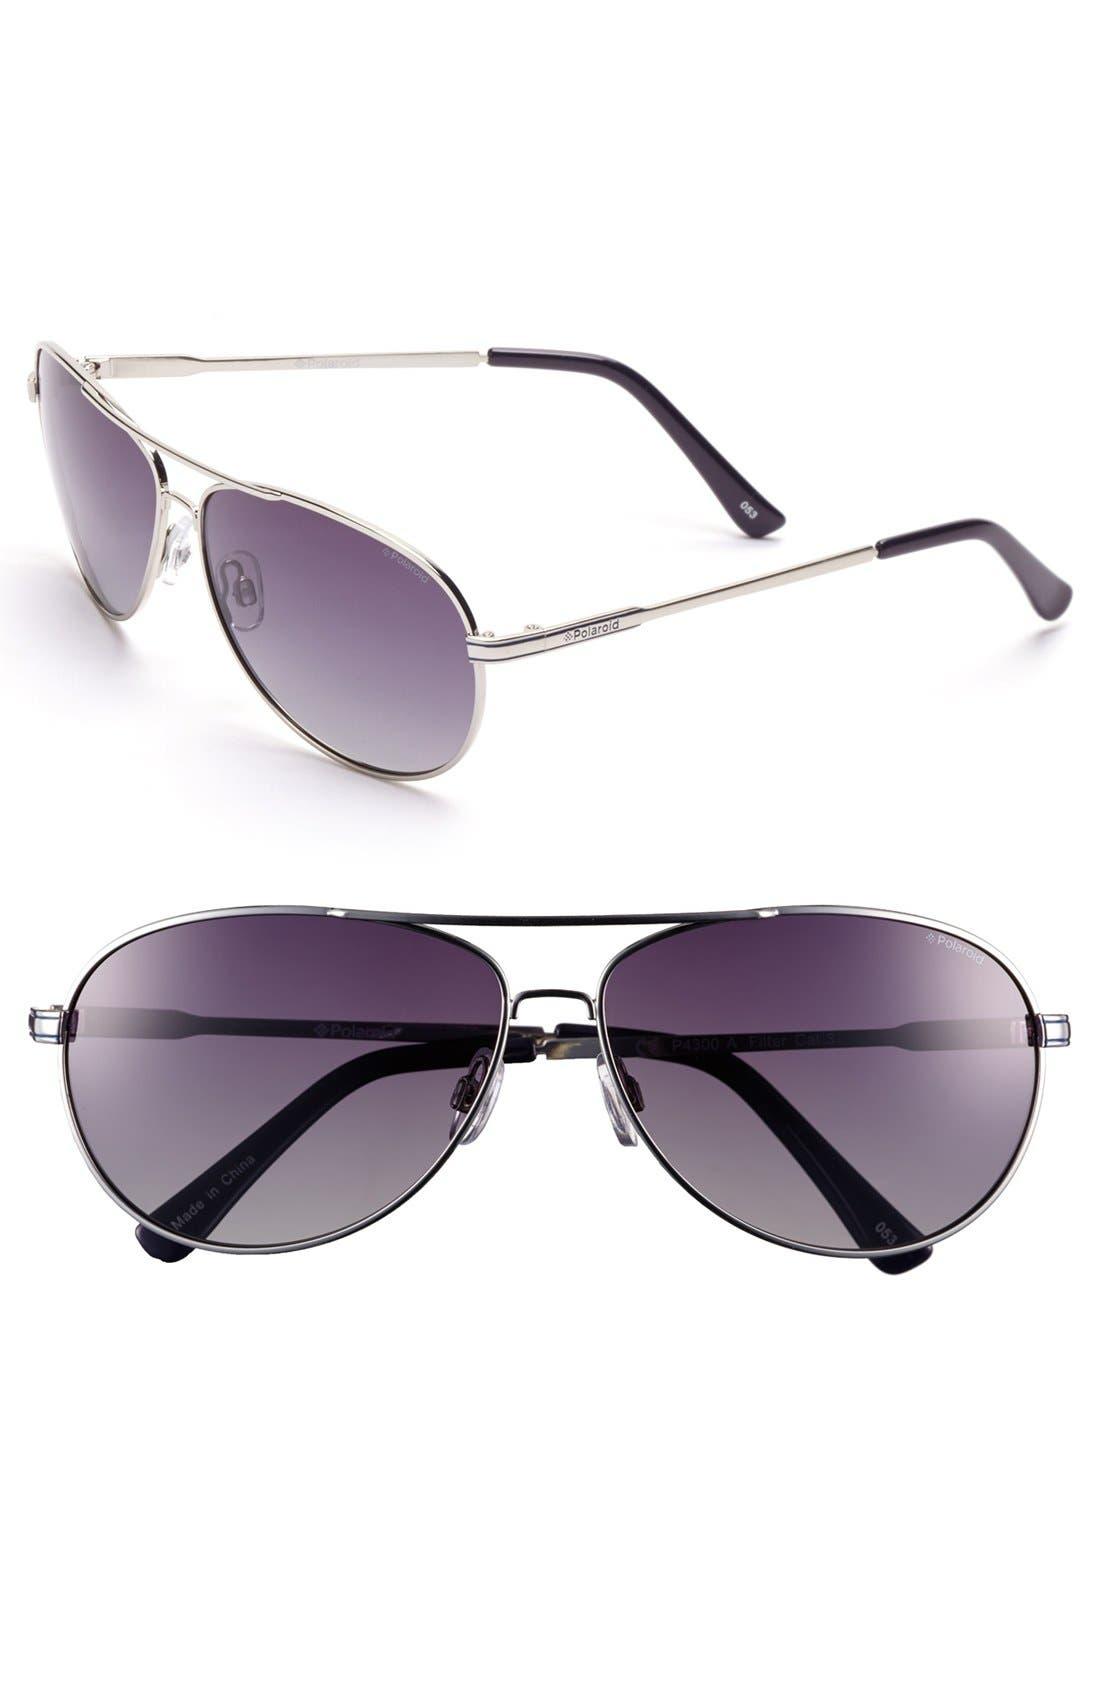 Alternate Image 1 Selected - Polaroid Eyewear 62mm Polarized Aviator Sunglasses